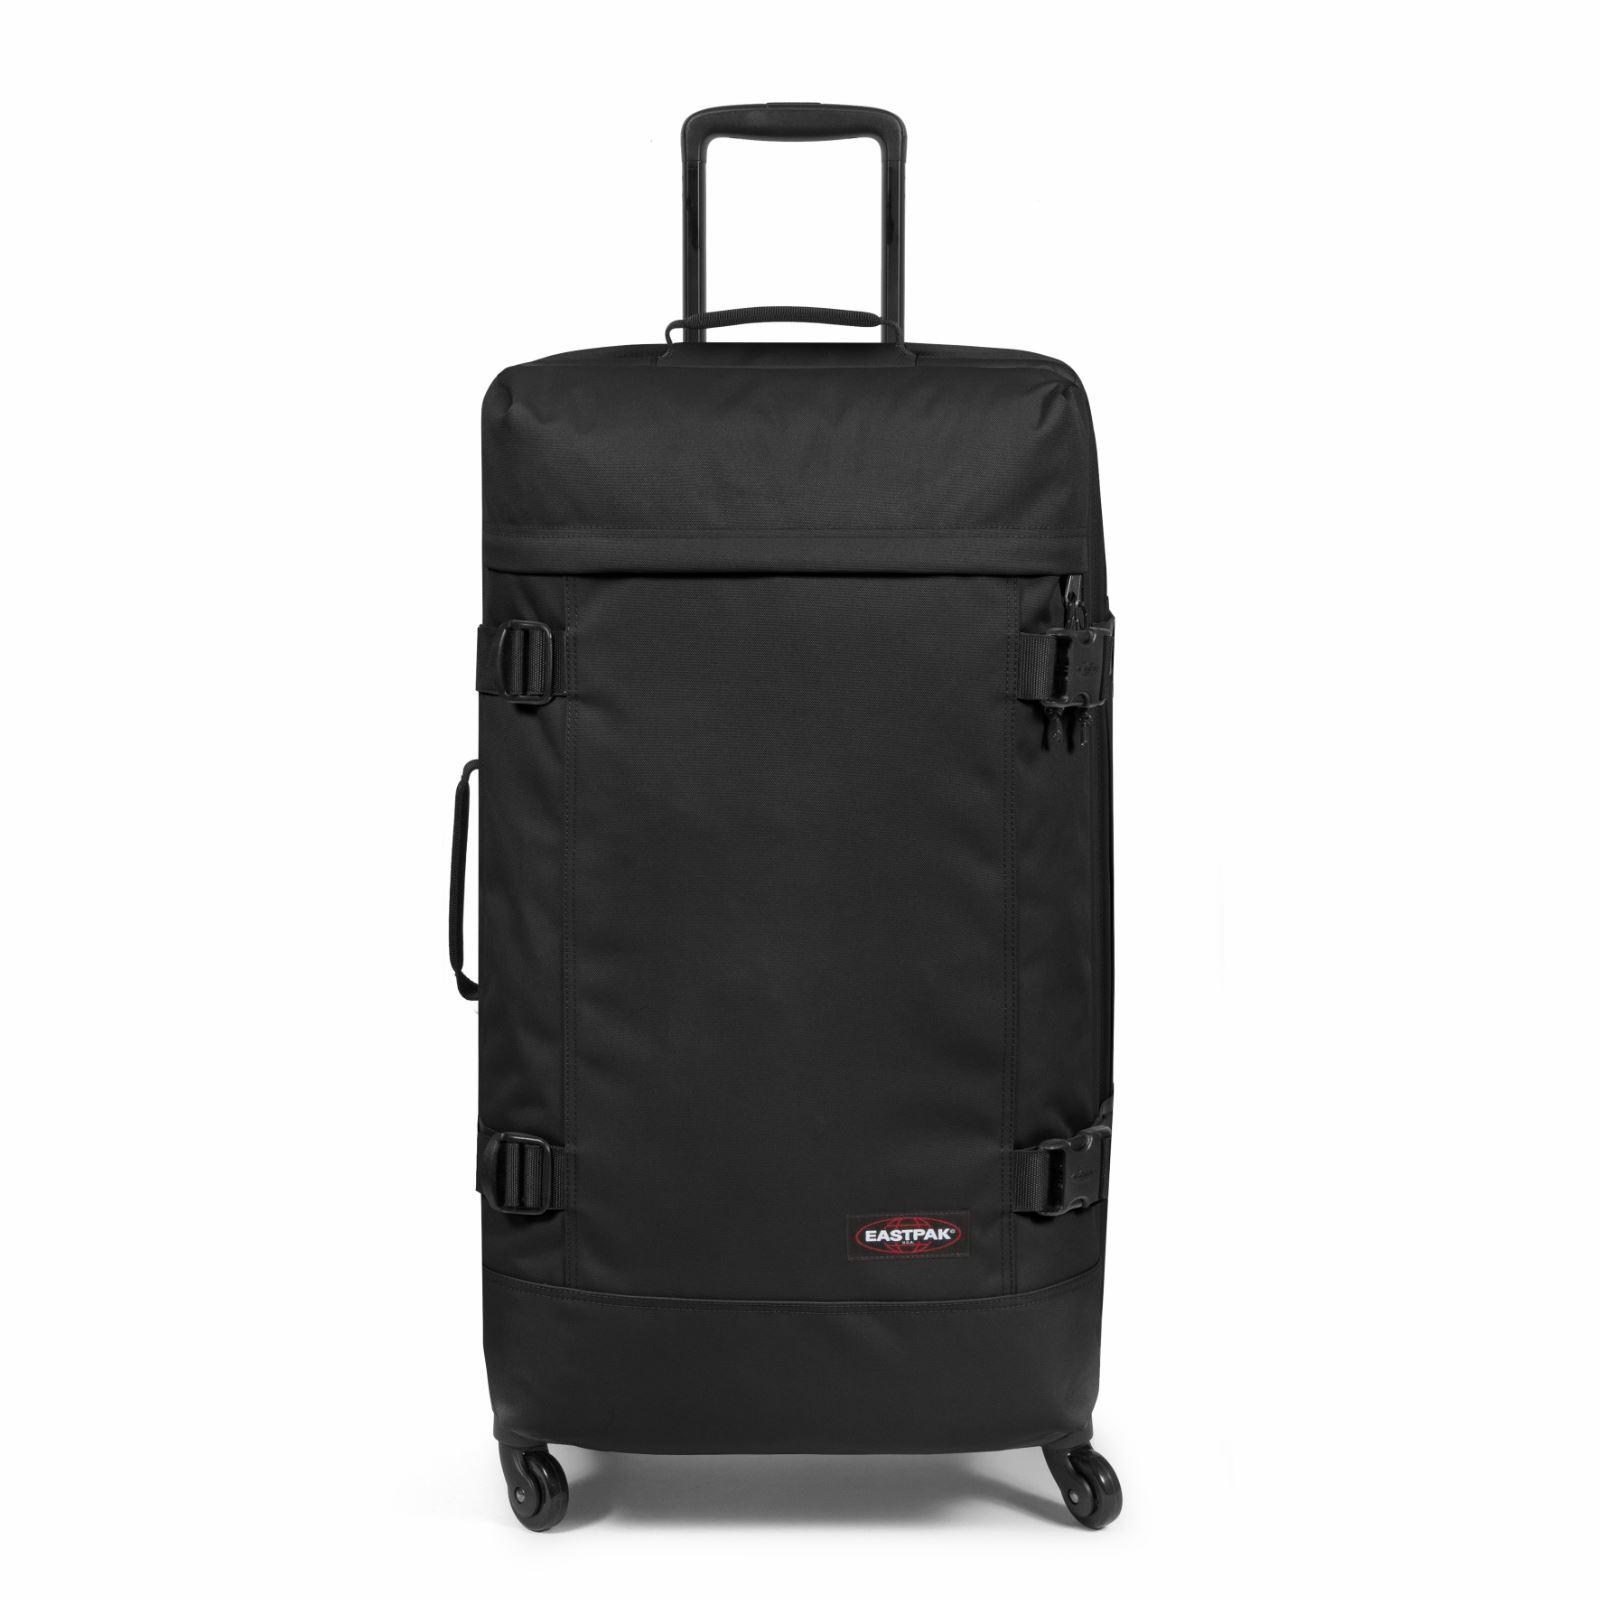 2018 sneakers beste prijs 100% authentiek Details about Eastpak Trans4 L Large 4 Wheel Rolling Suitcase / Holdall -  30 Year Warranty